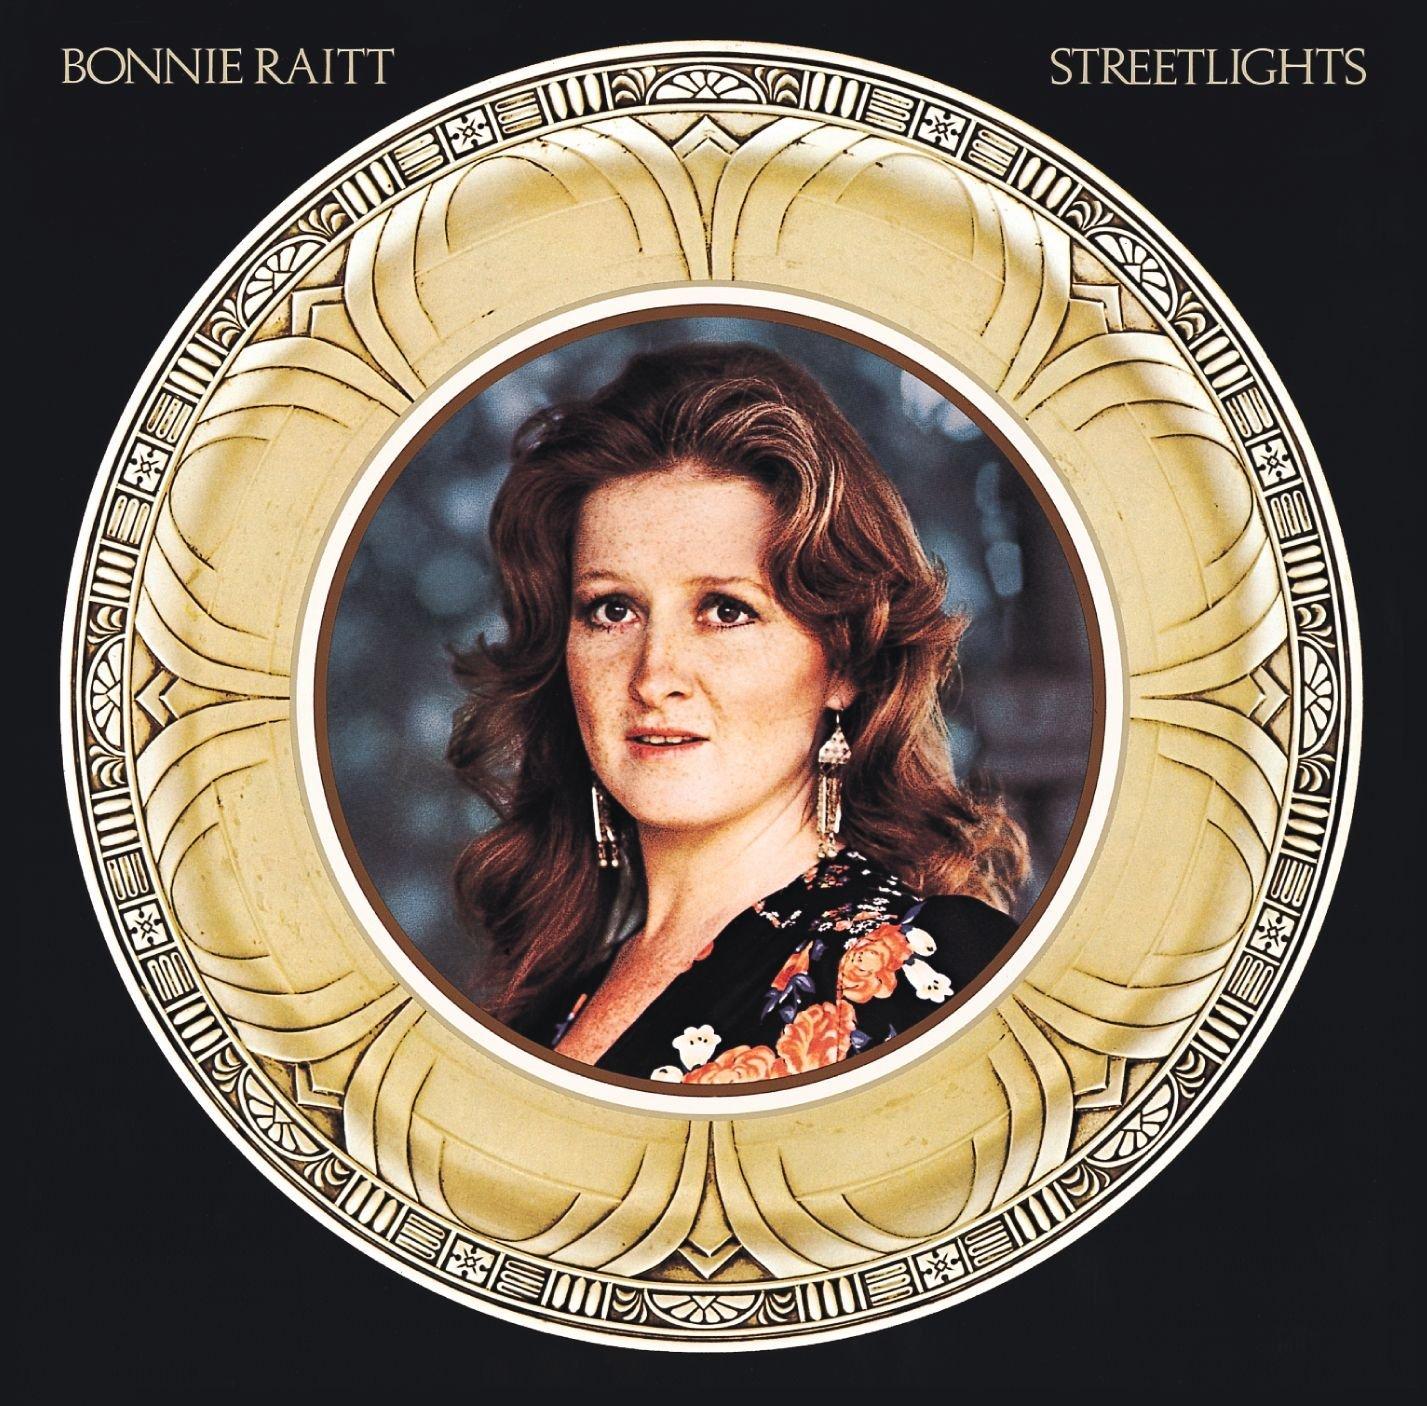 Bonnie Raitt: Angel from Montgomery